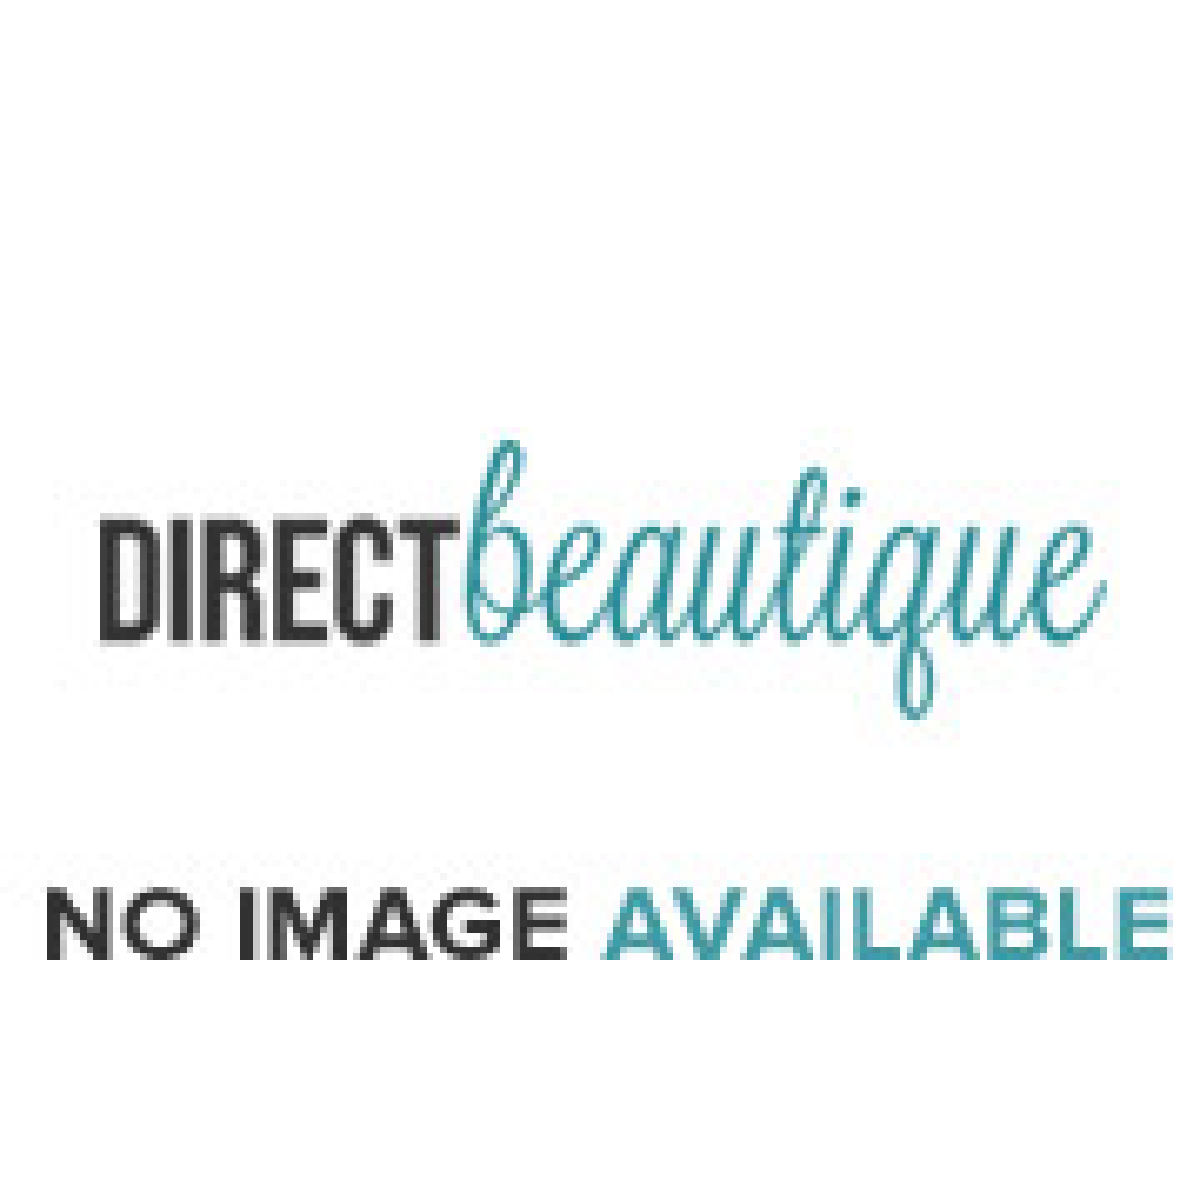 Clarins Festive Treats Eyes and Lips Gift Set 3.5ml Supra Volume Mascara + 5ml Light Natural Lip Perfector - 01 Rose Shimmer